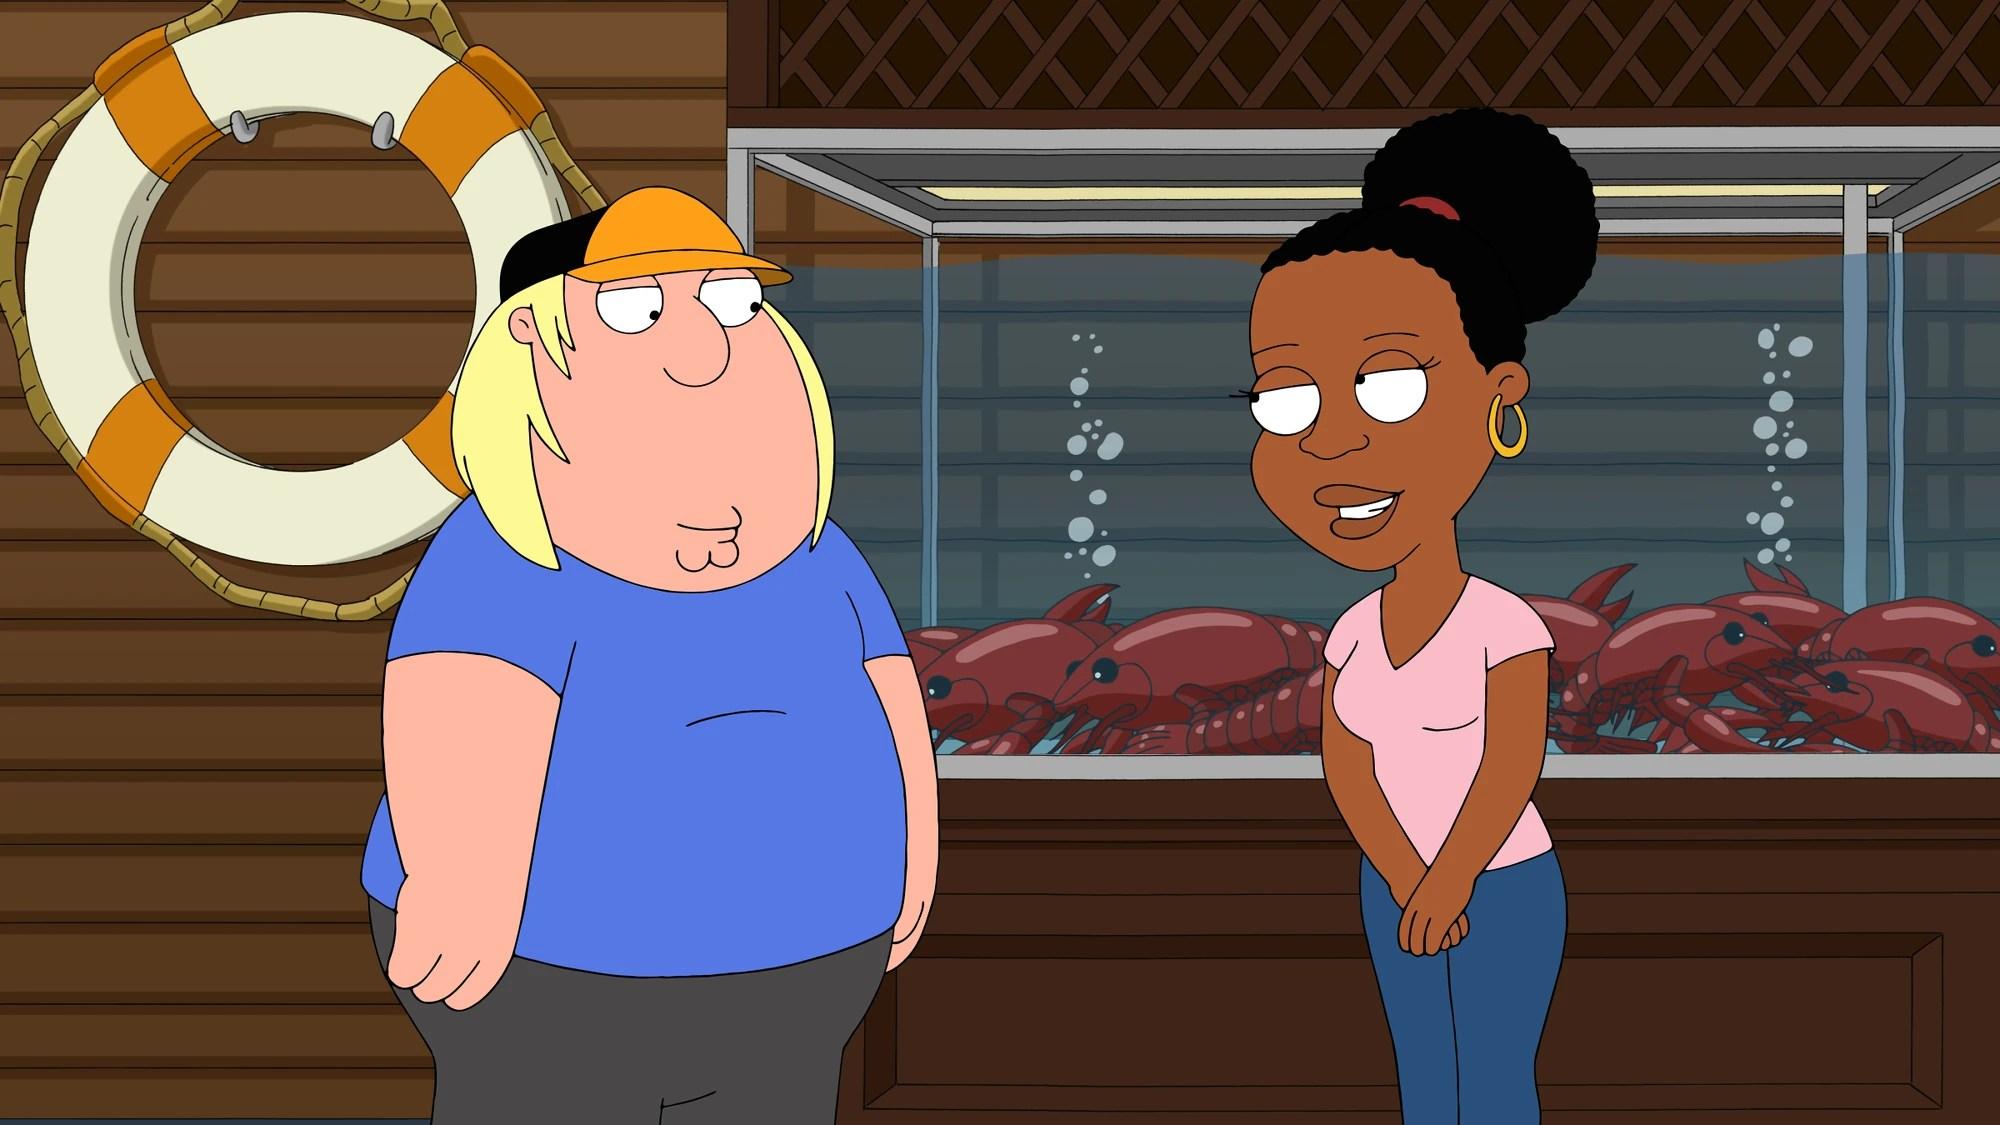 Derek Jeter Wallpaper Quotes Baby Got Black Family Guy Wiki Fandom Powered By Wikia